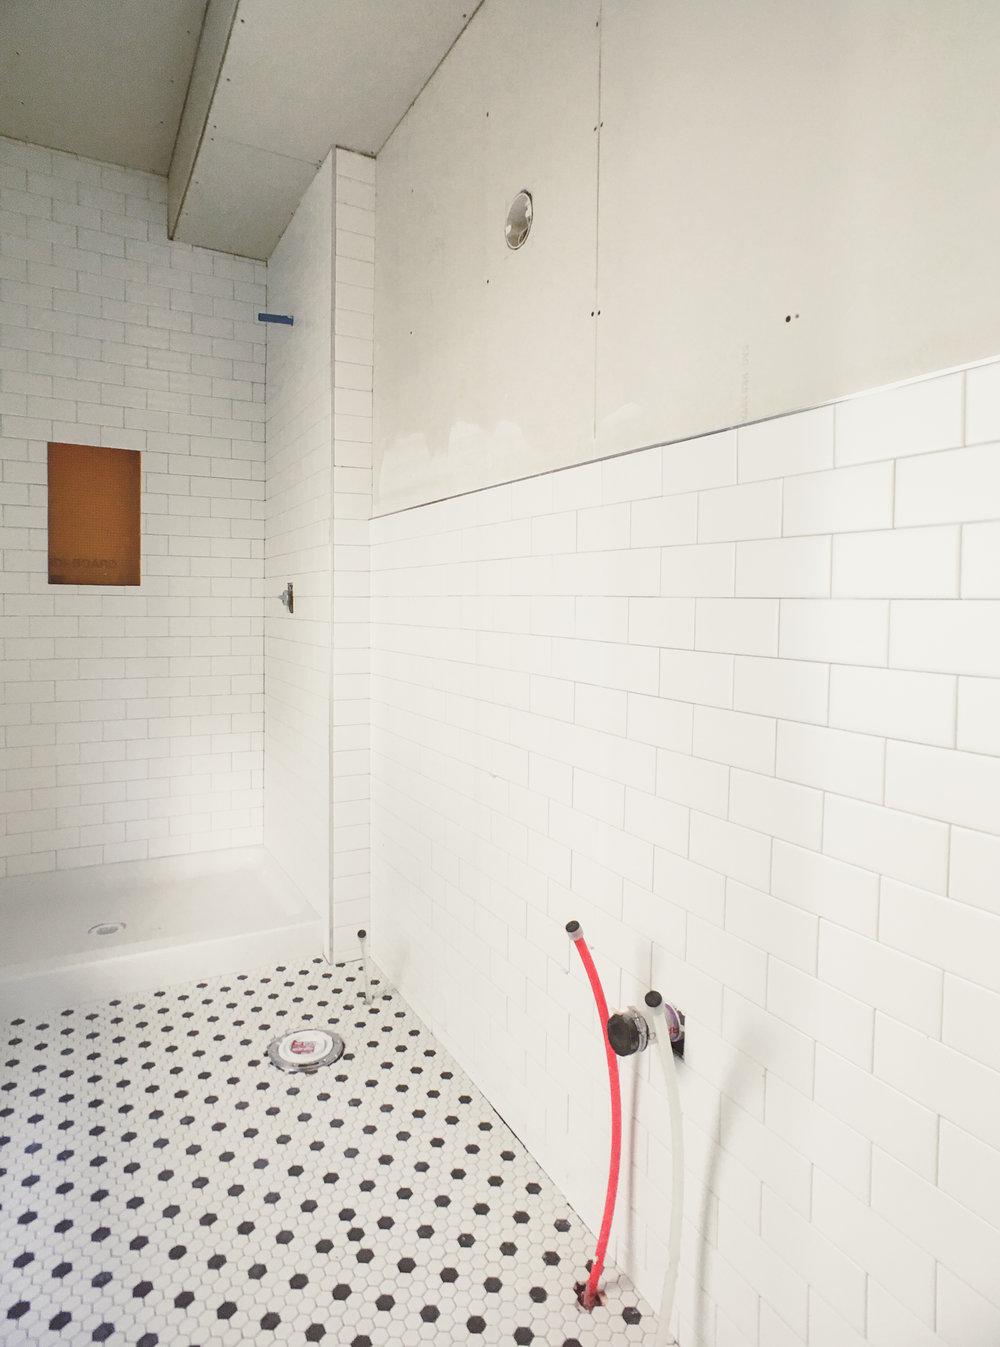 Classic tile style howlett co bathroom tile dailygadgetfo Choice Image